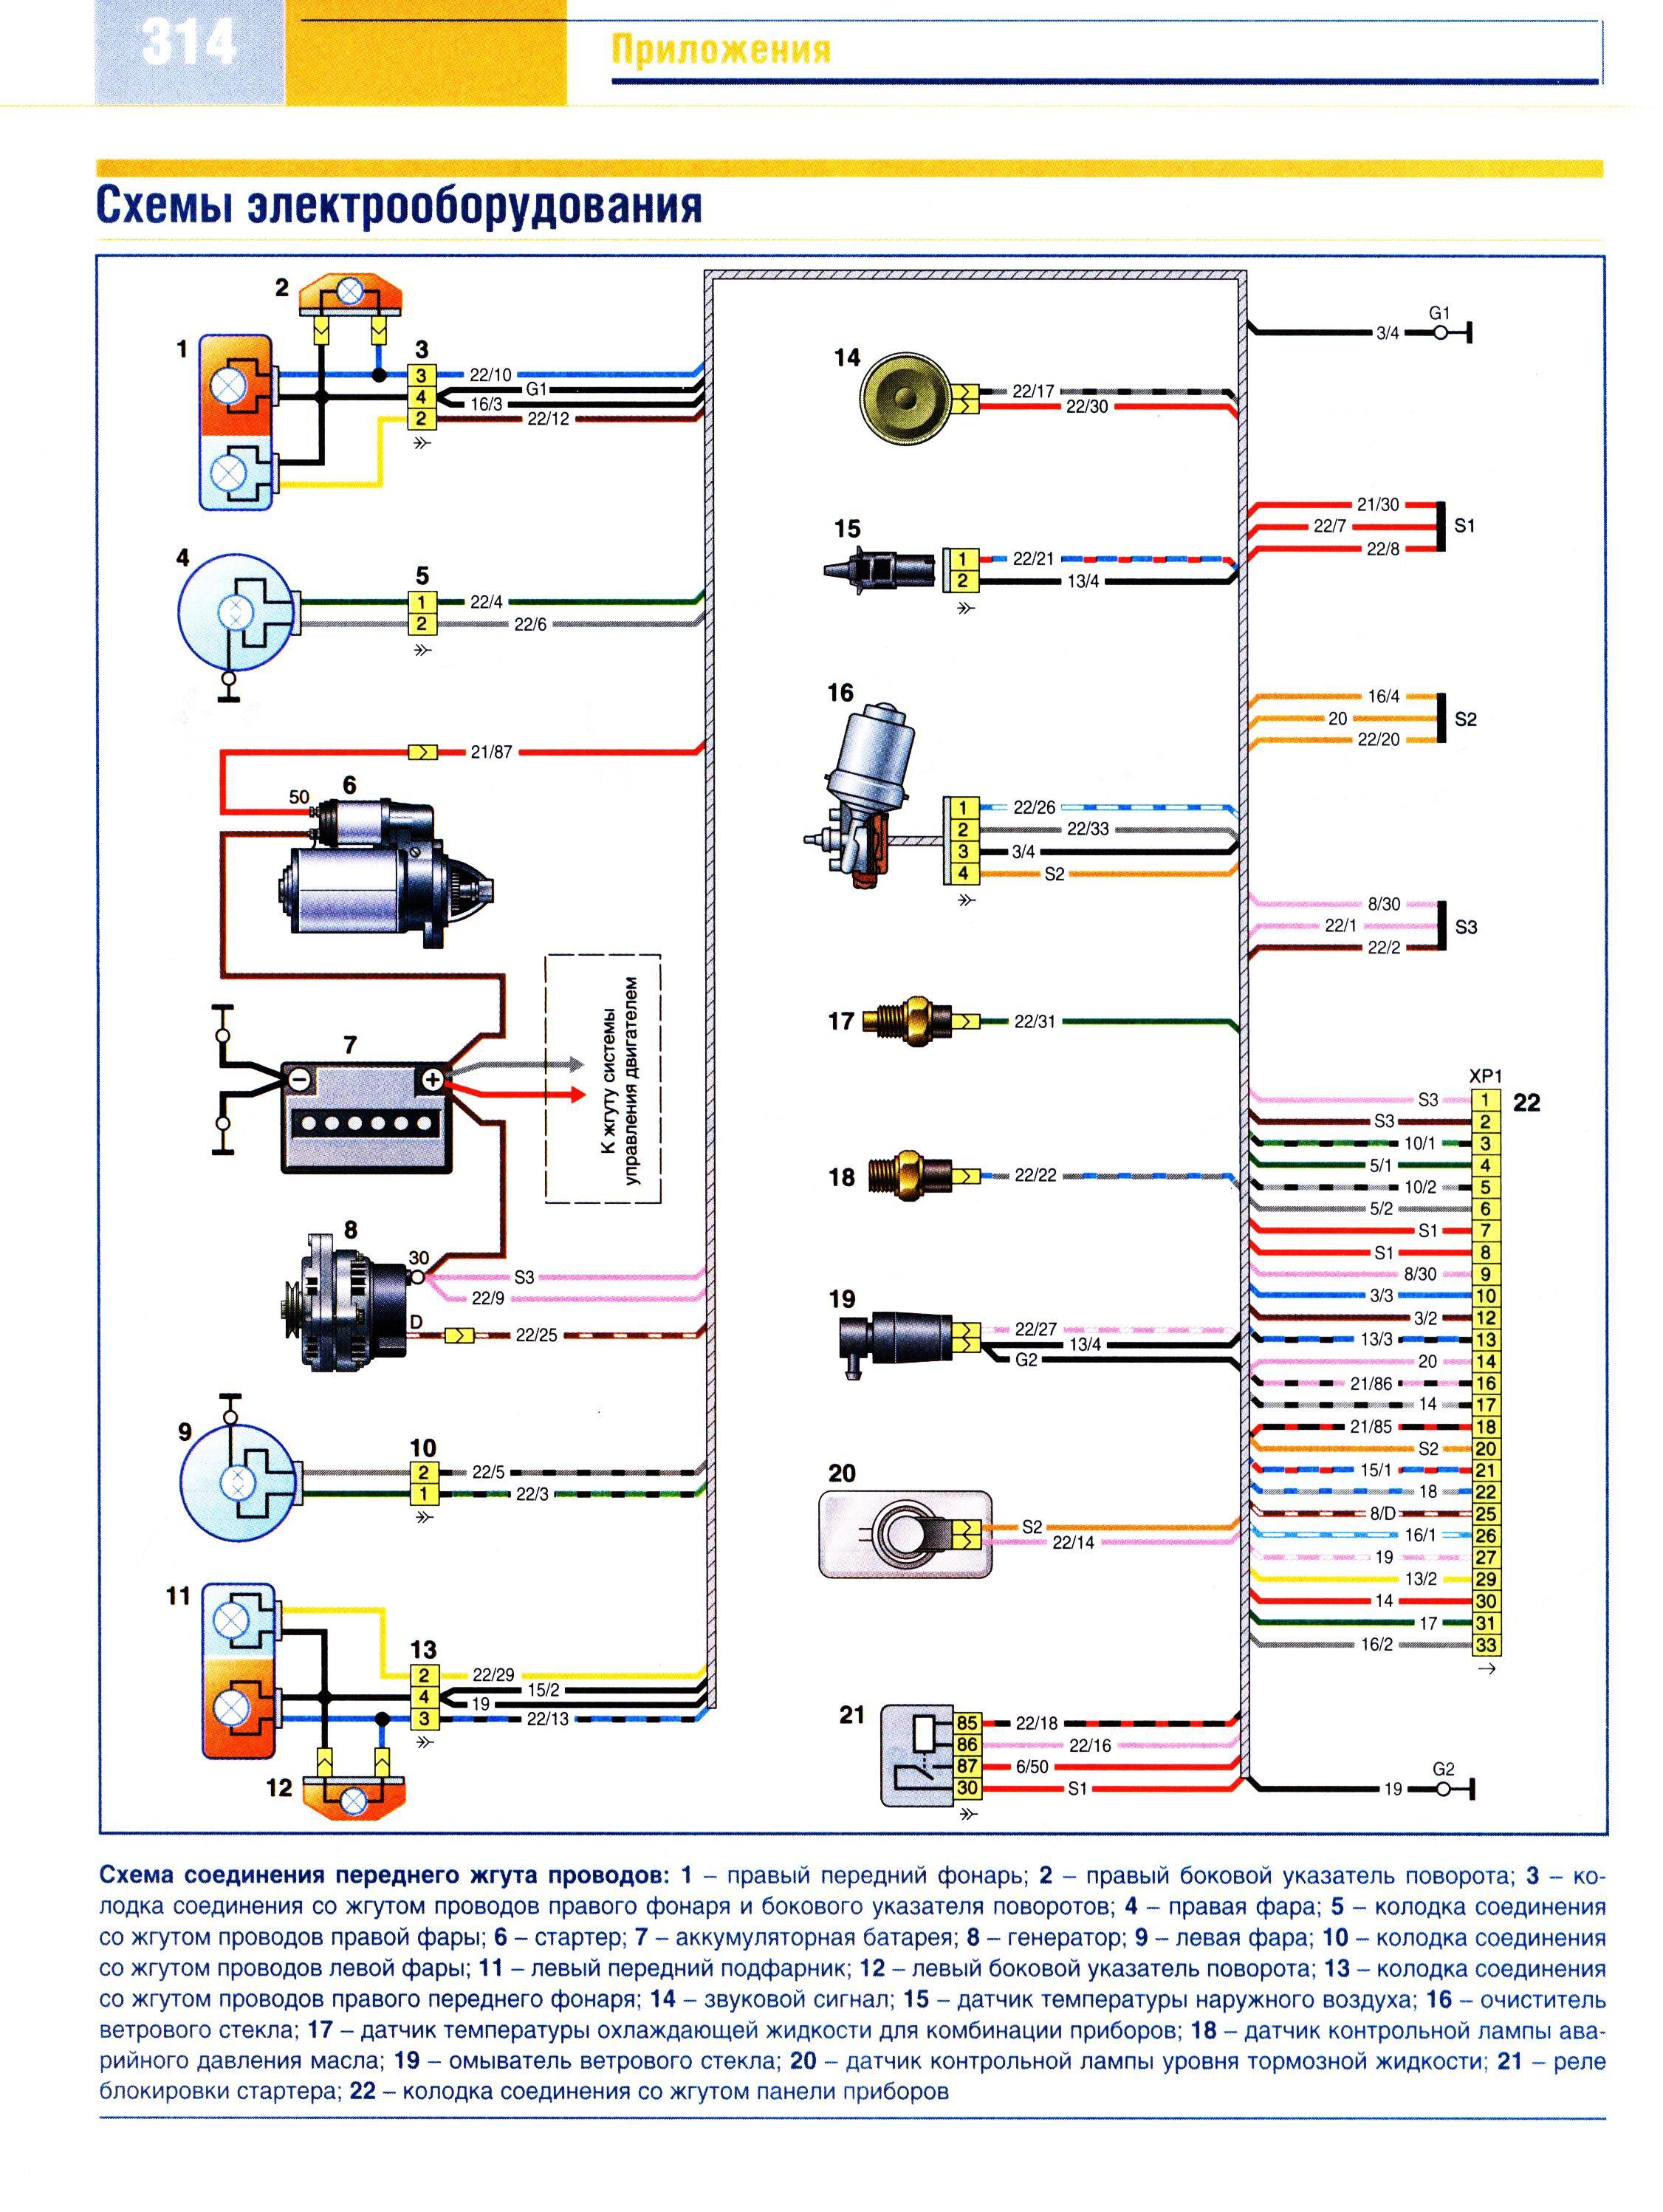 Схема главного тормозного ваз 2101